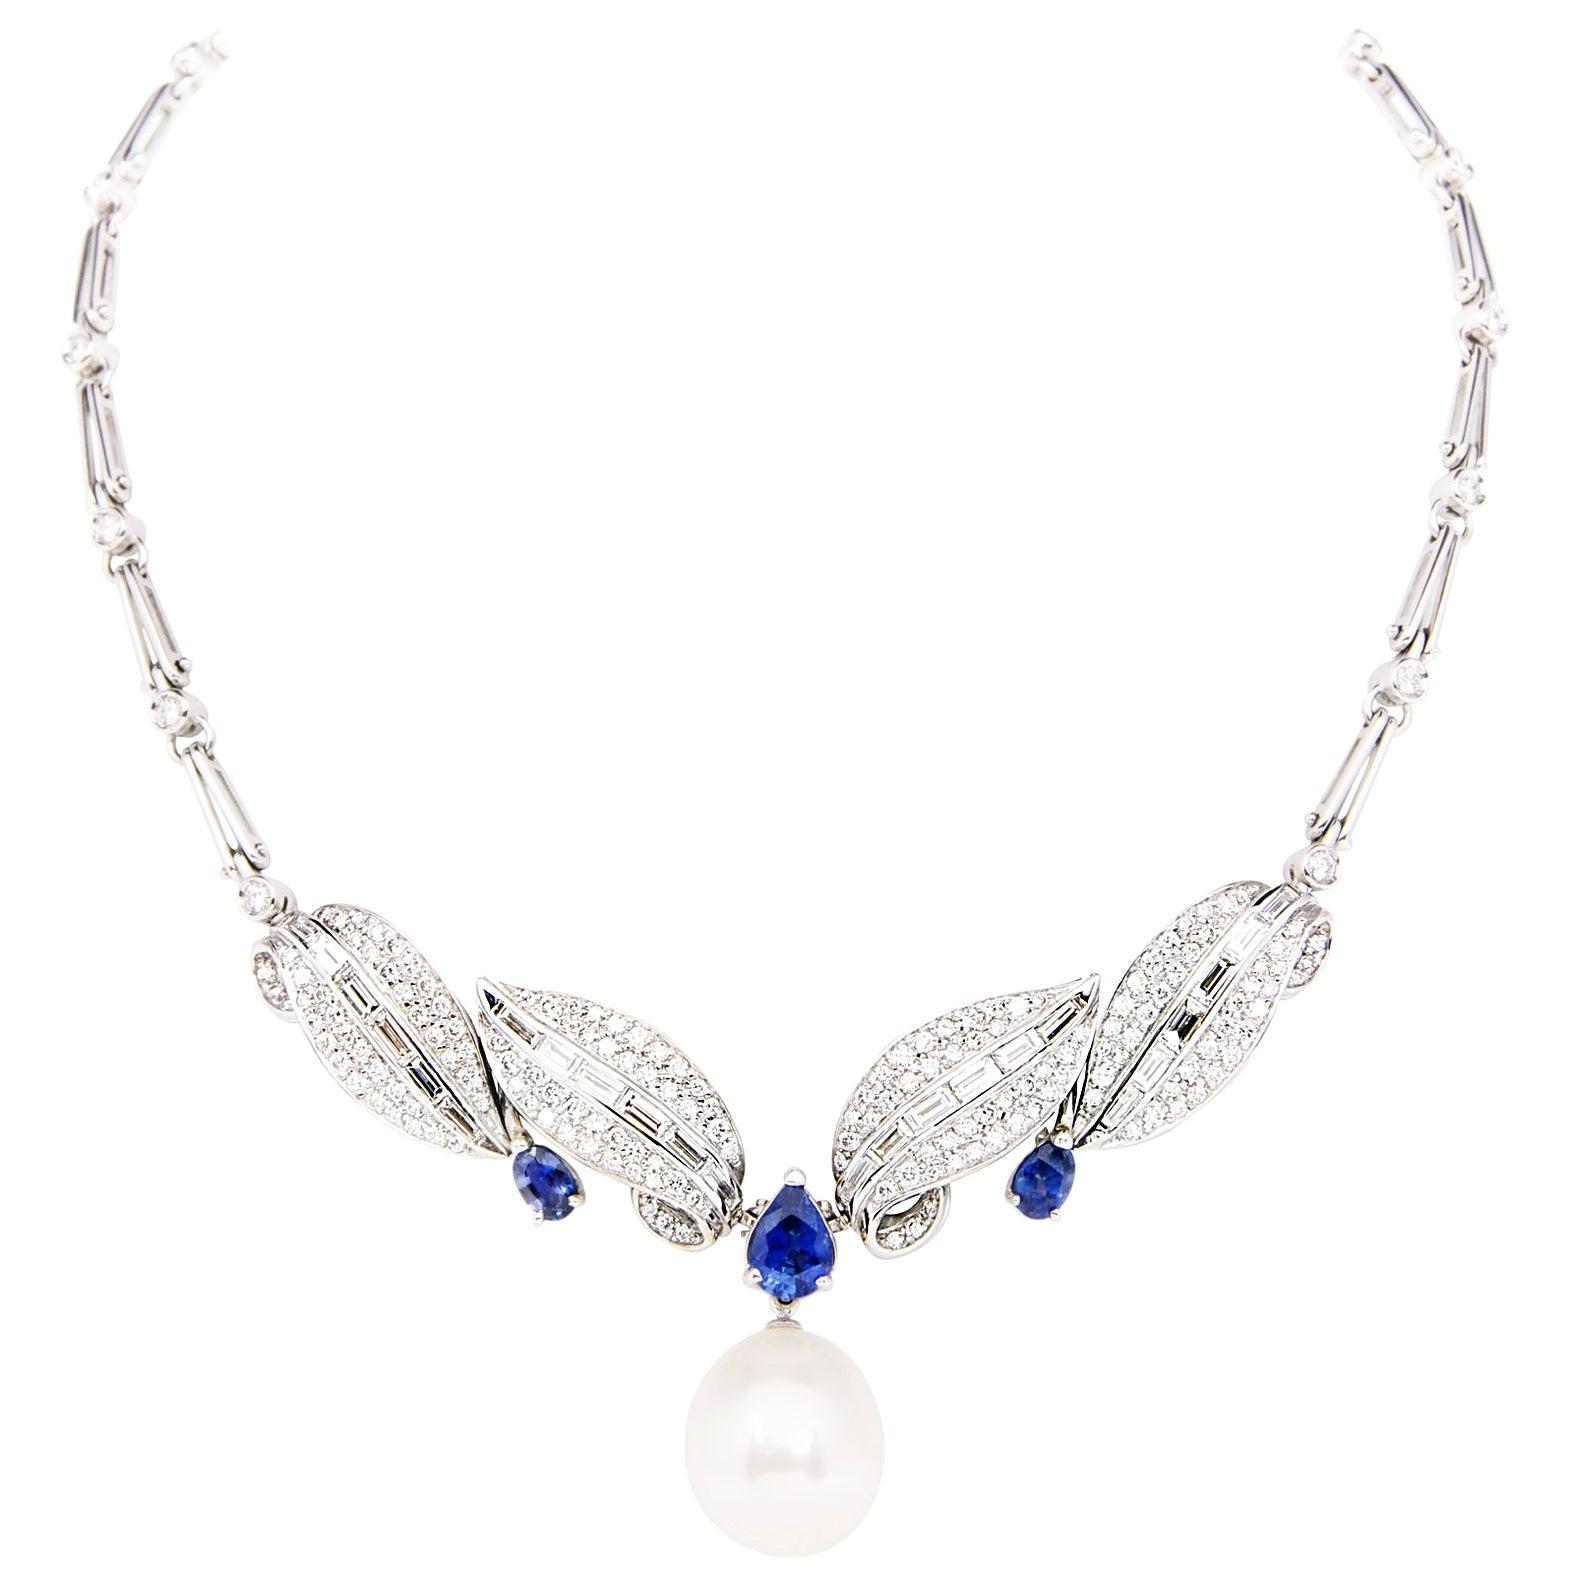 Ella Gafter Blue Sapphire Diamond Necklace